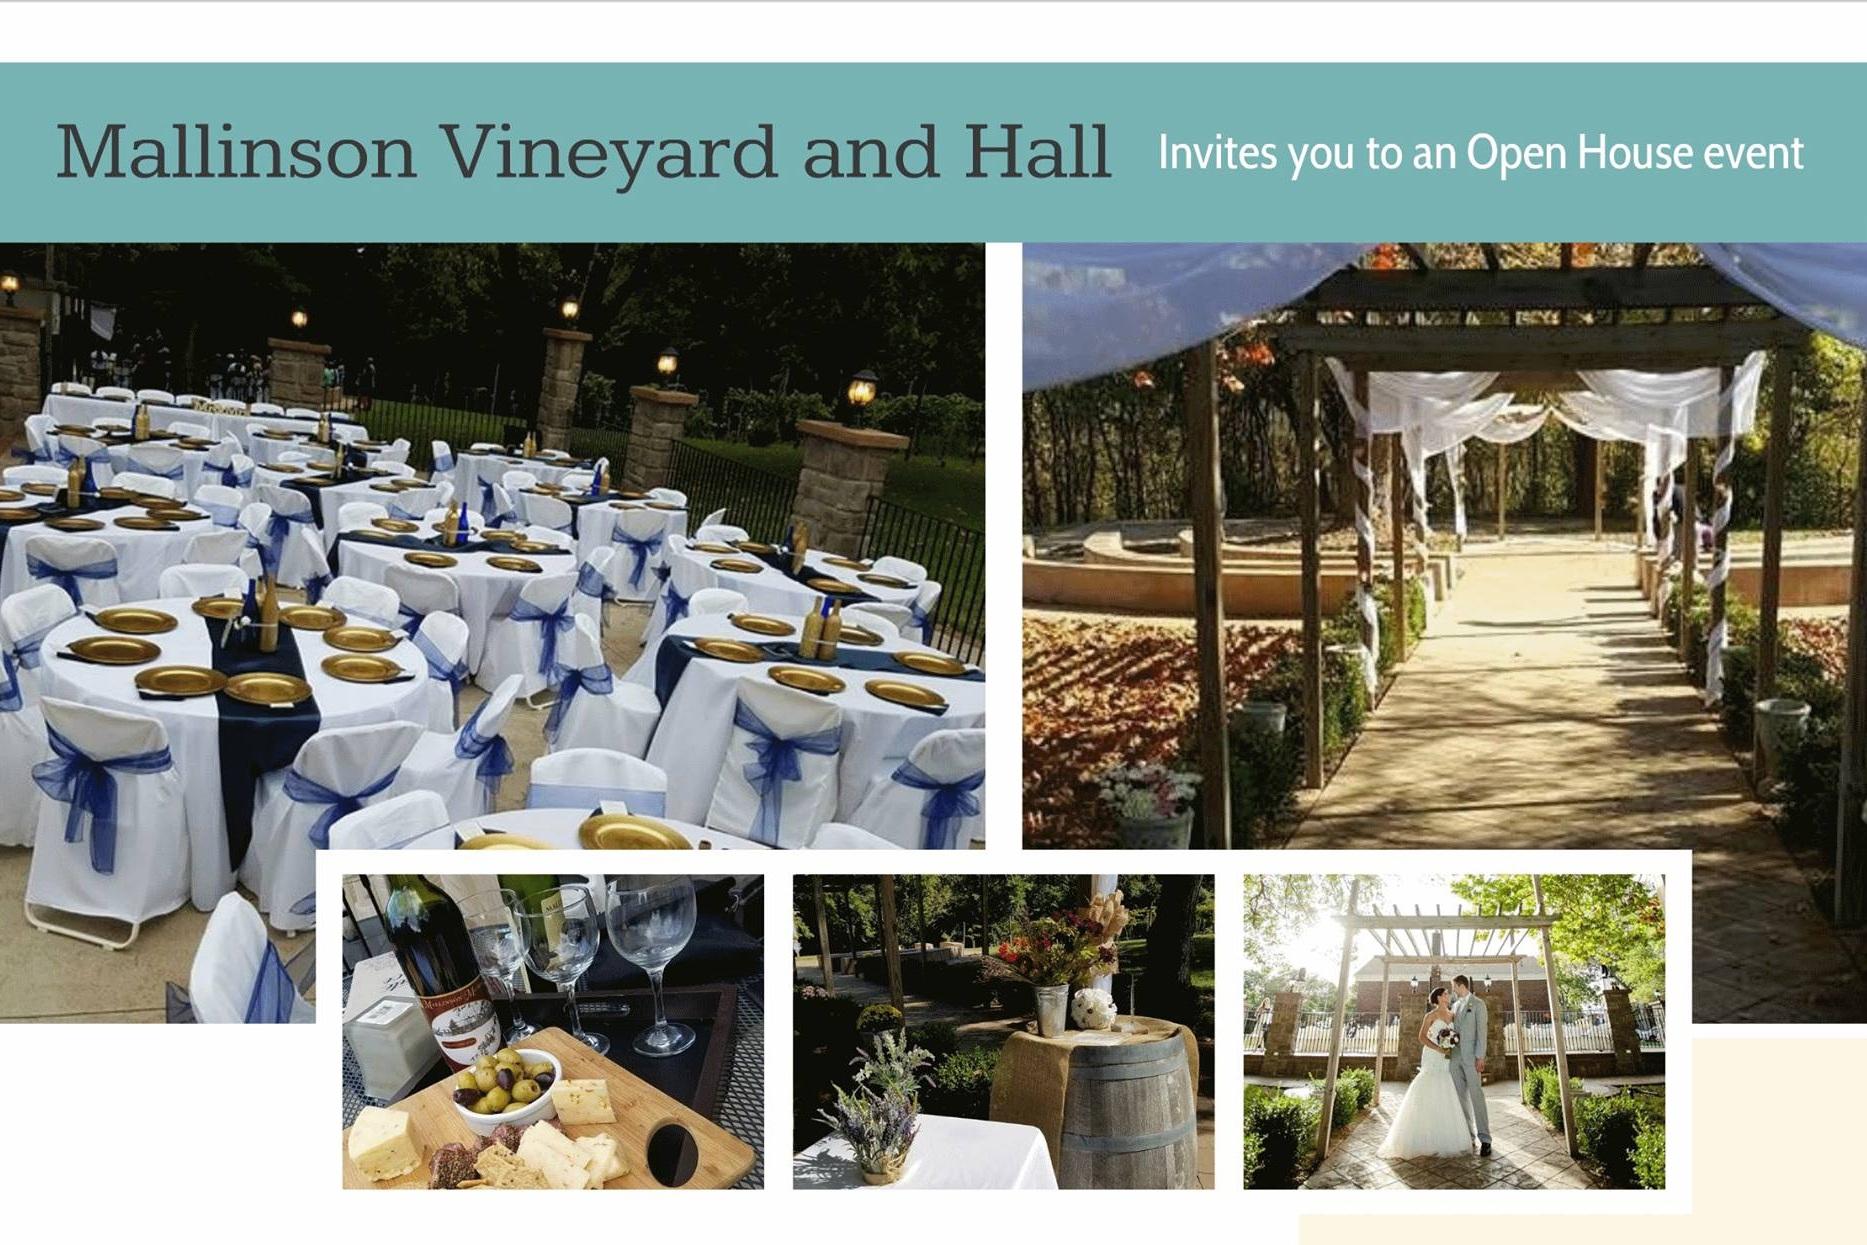 Mallinson+Vineyard+and+Hall+Open+House+-+Sugar+Creek+MO+-+Independence+MO.jpg